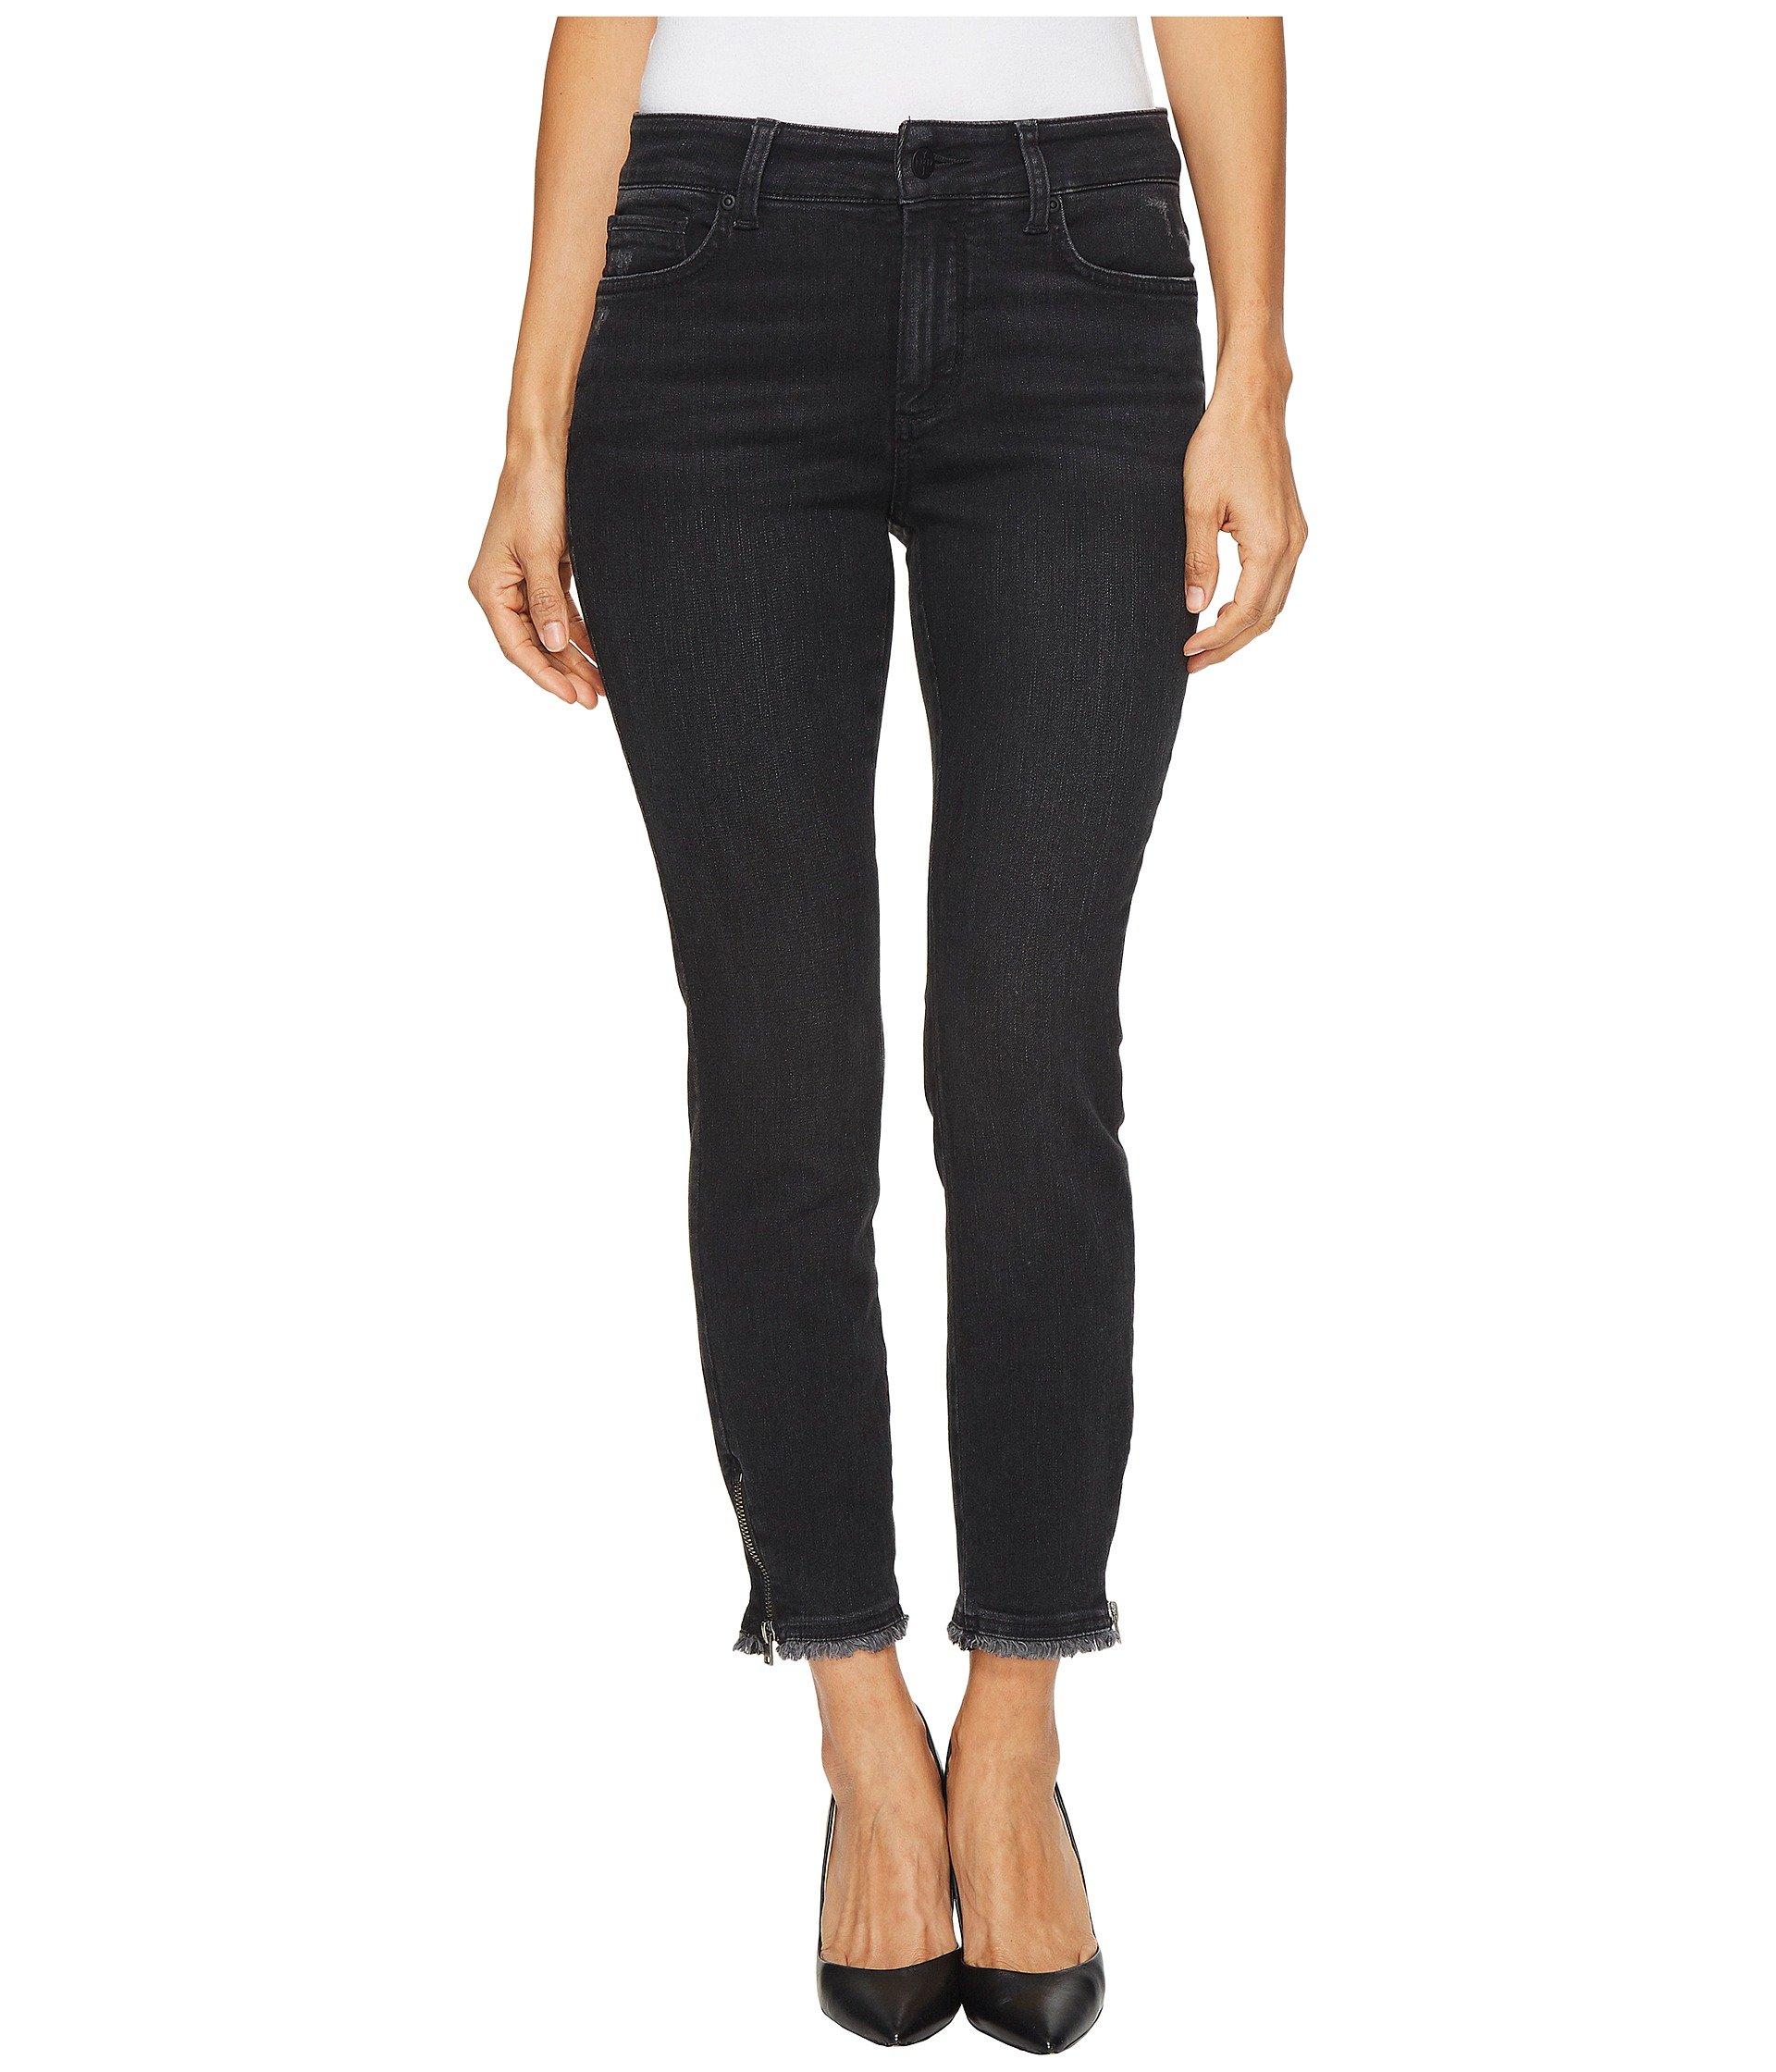 NYDJ Women's Petite Size Ami Skinny Legging Jeans in Future Fit Denim, Campaign, 16P